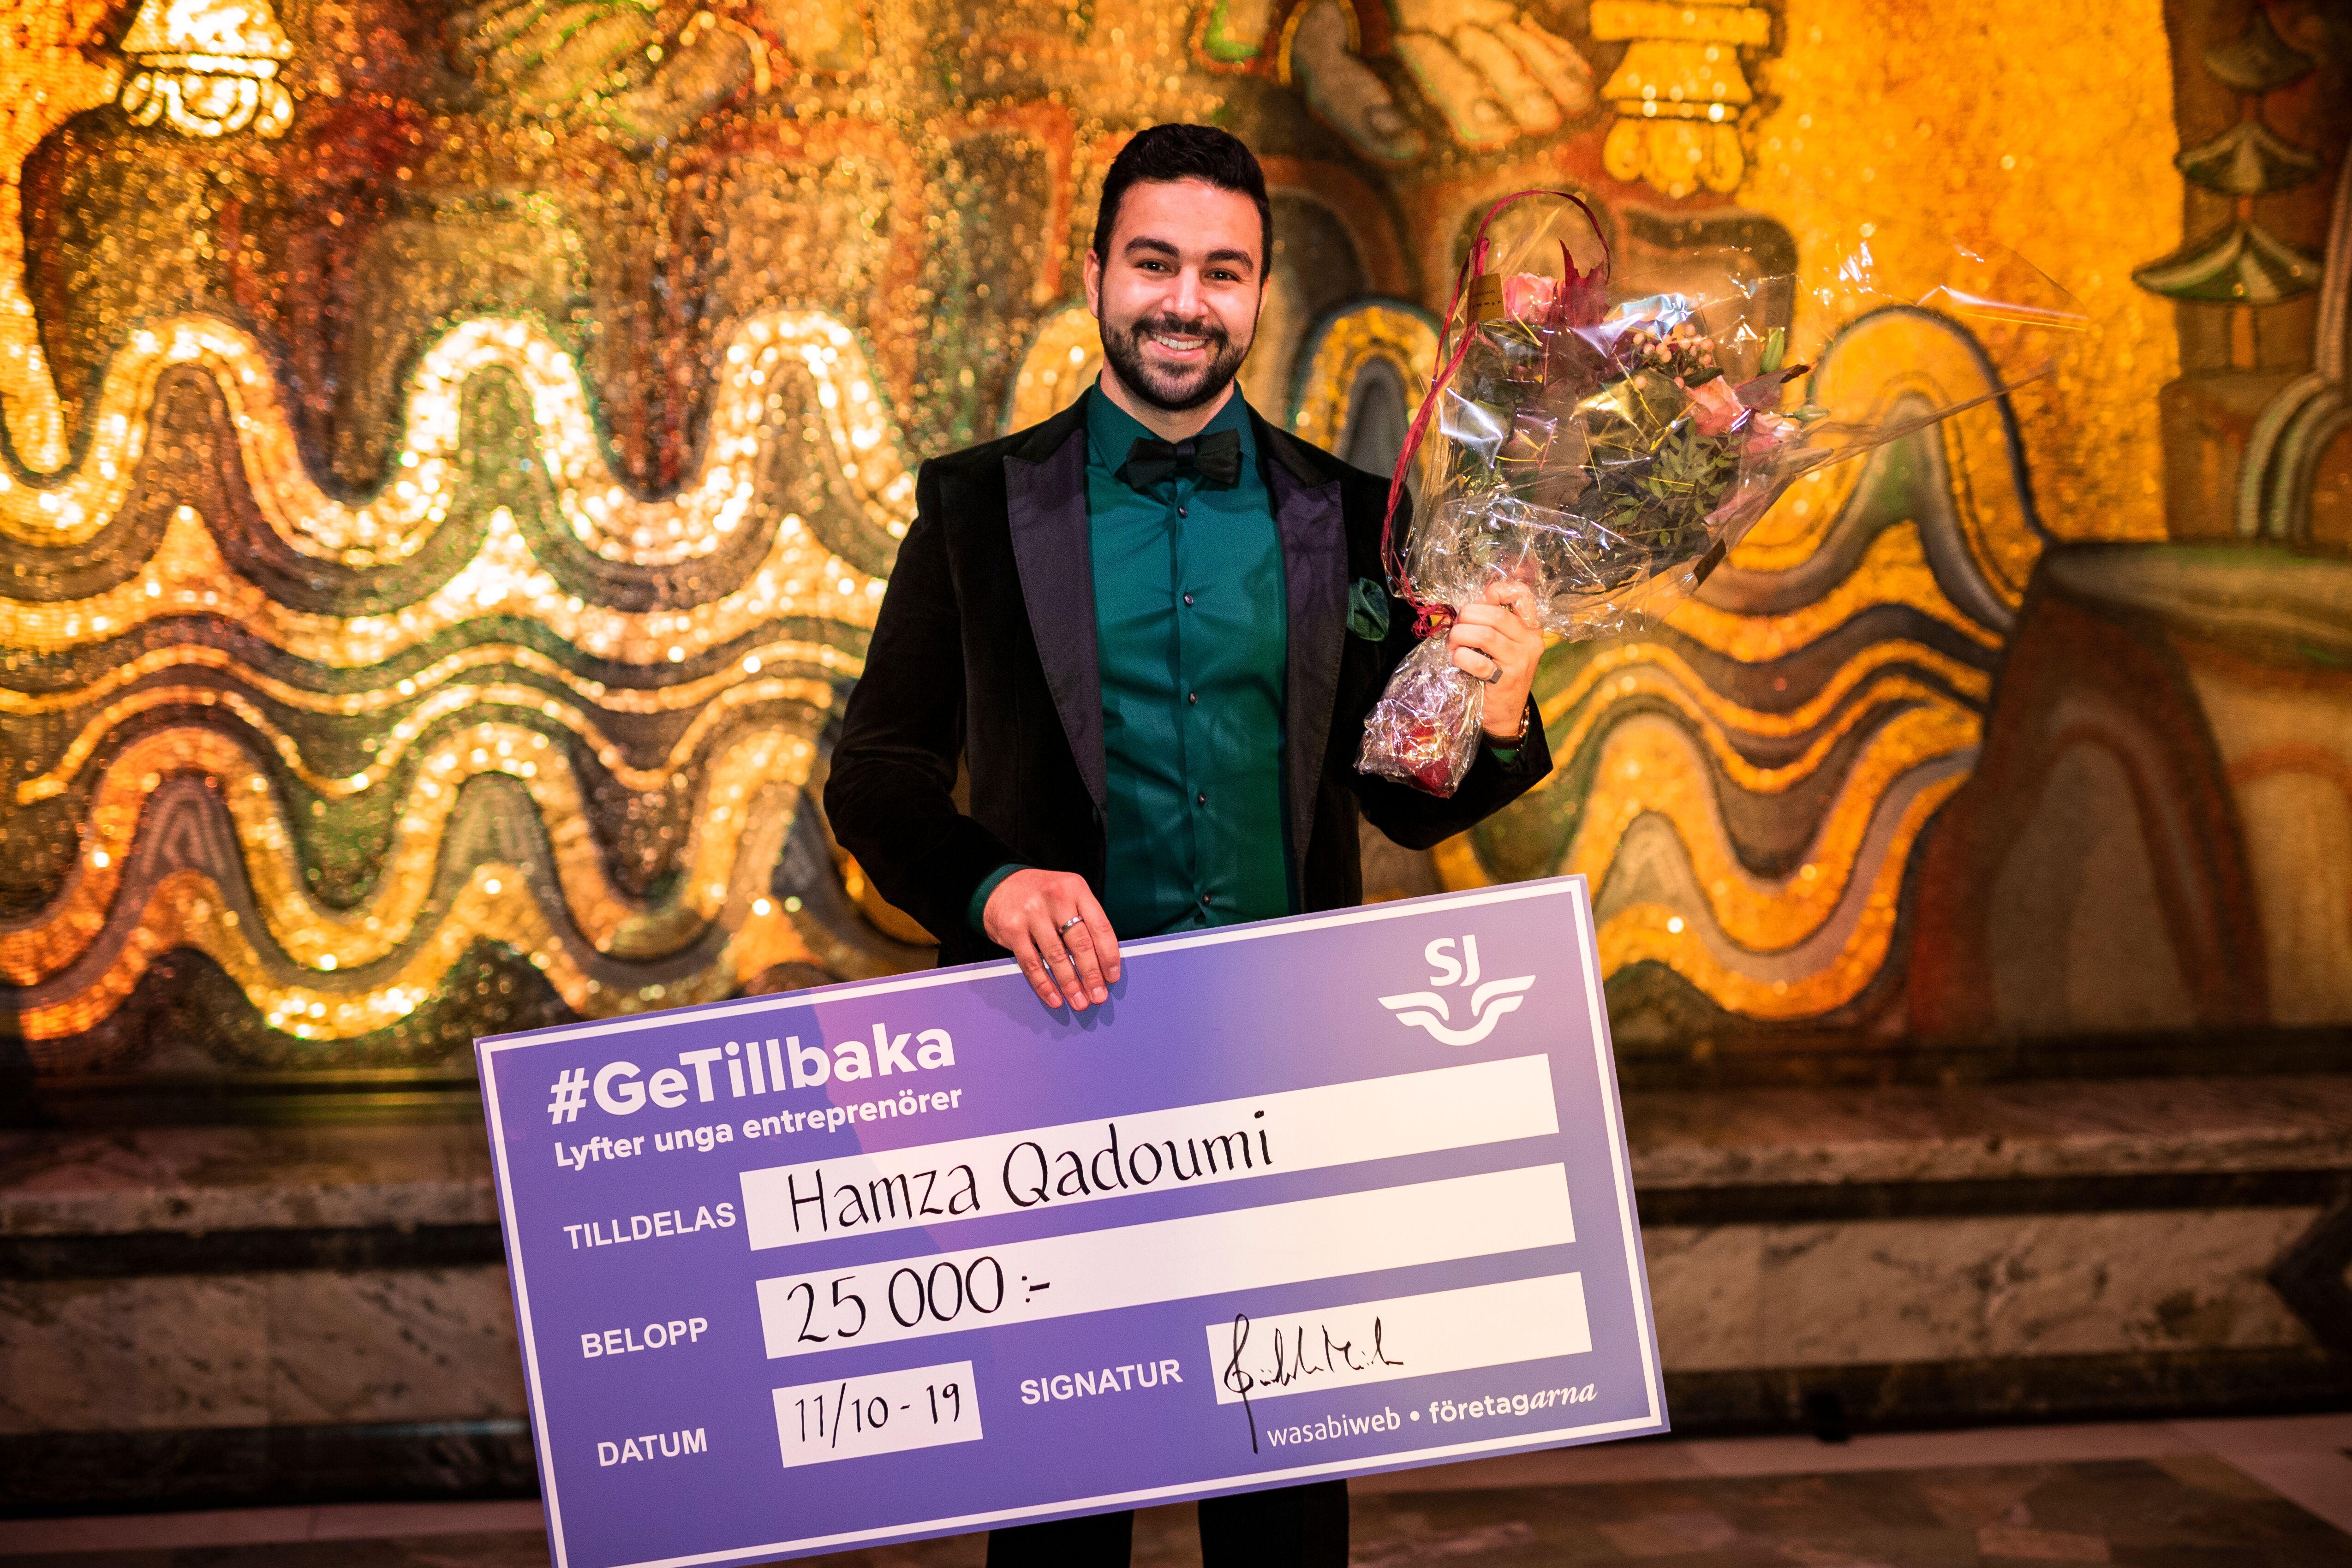 hamza sweden's young entrepreneur